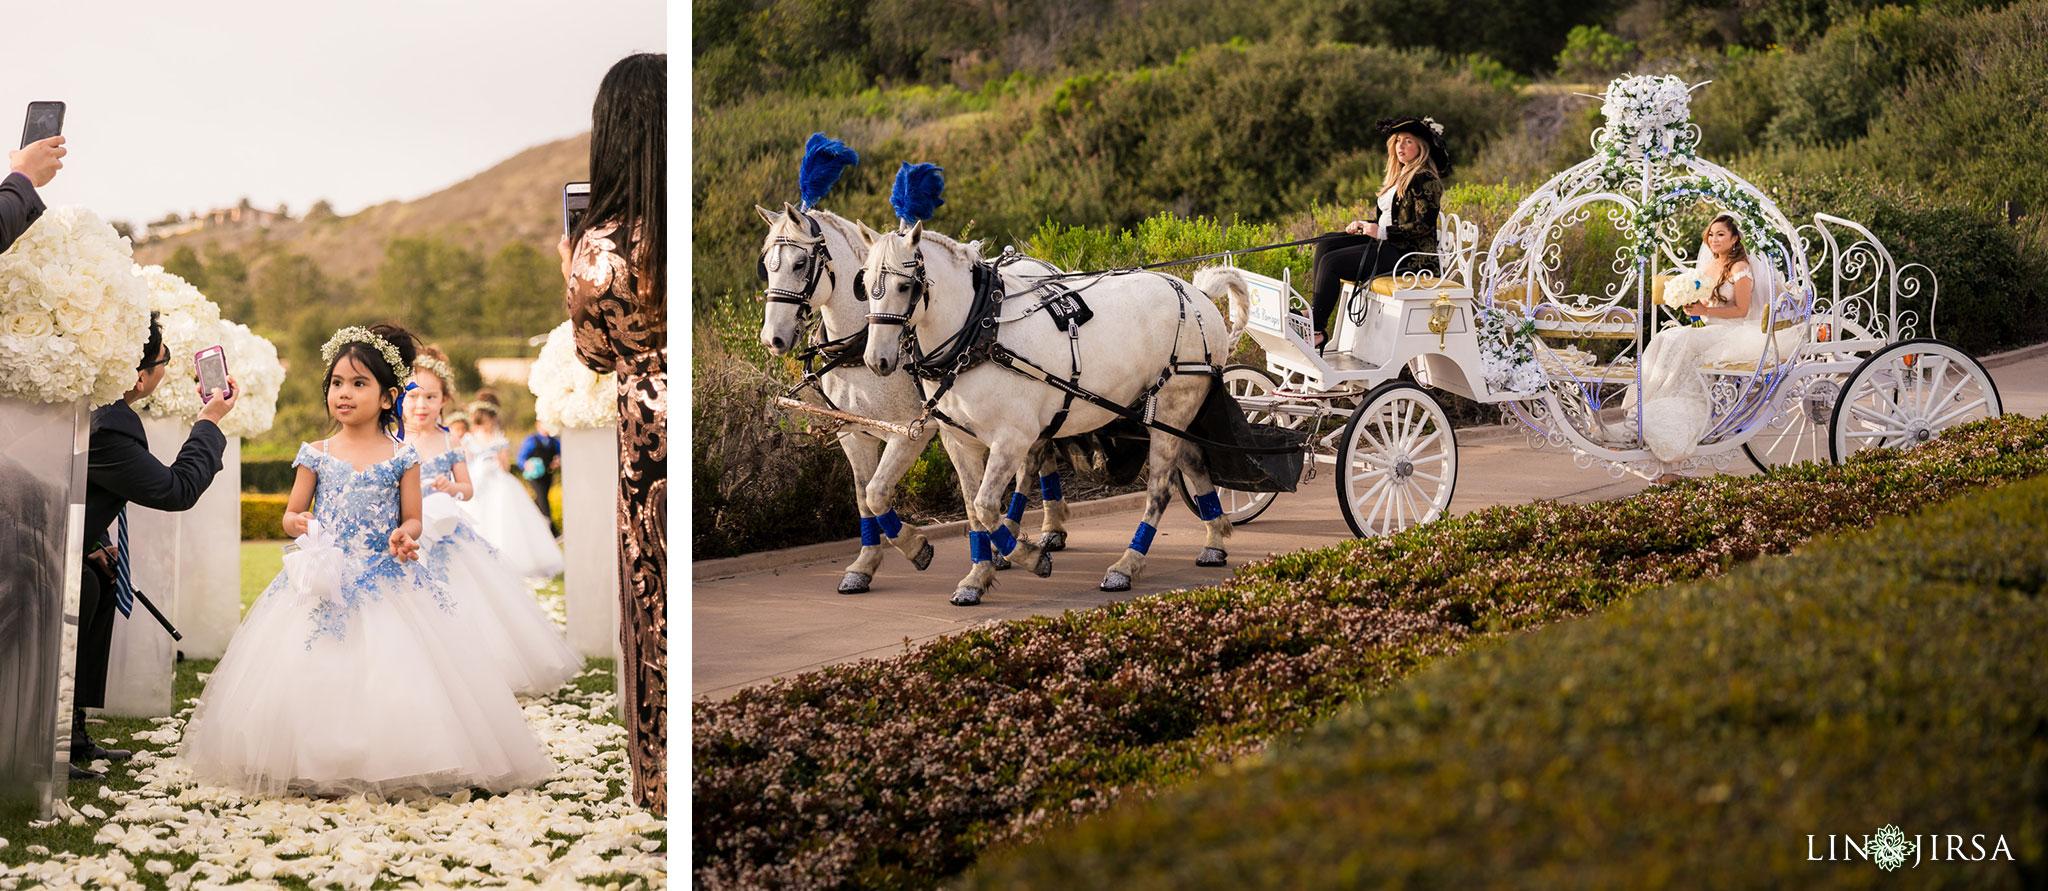 19 pelican hill resort orange county wedding ceremony photography